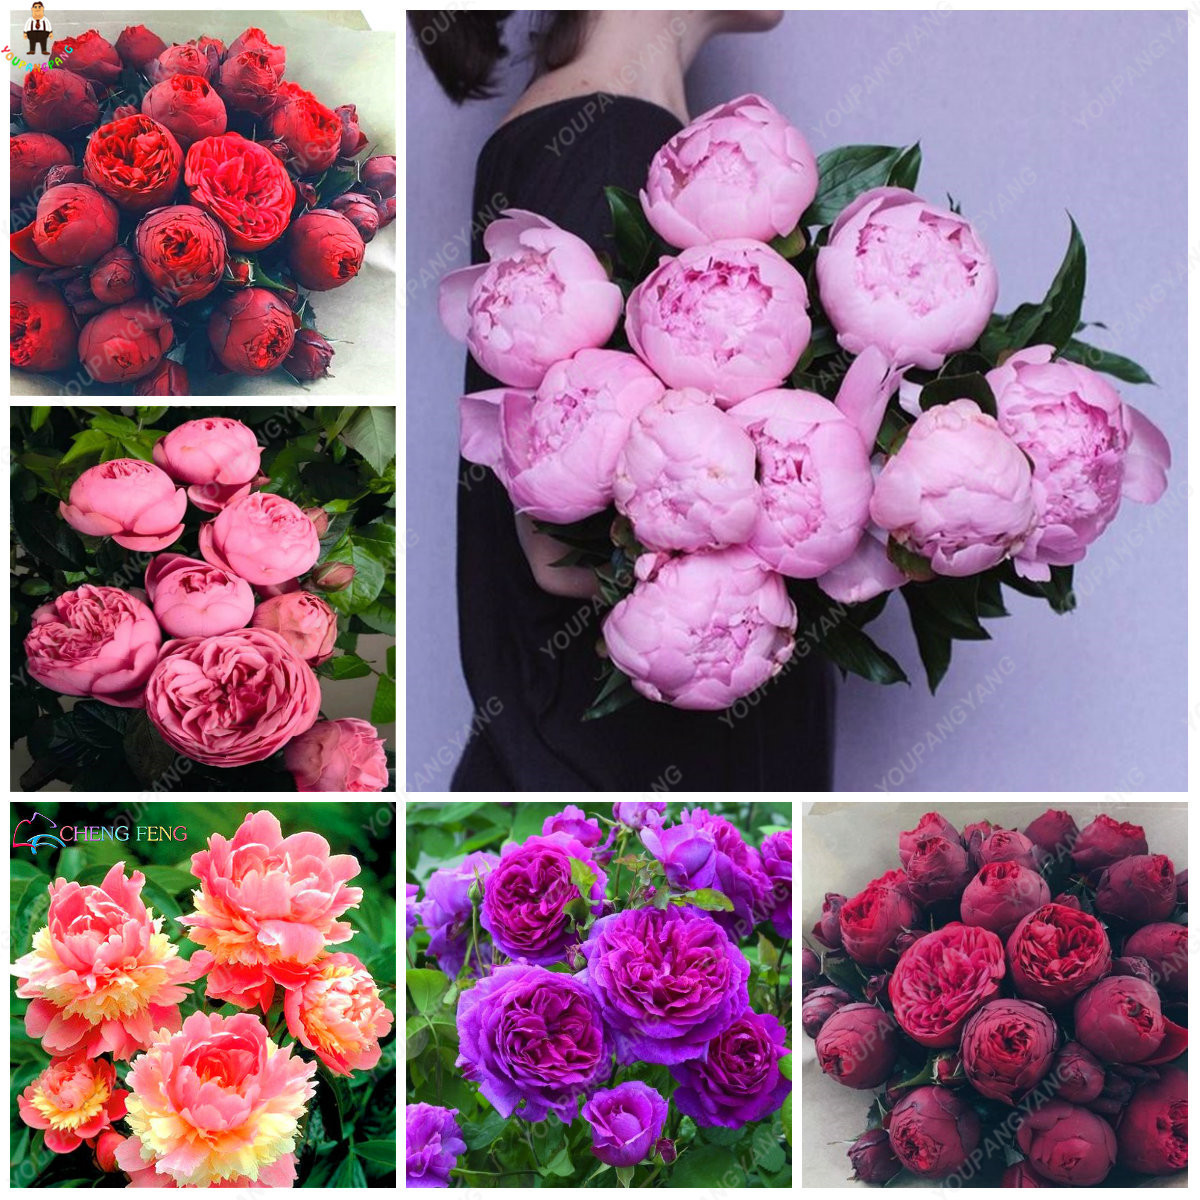 Compre 20 Unids Bonsai Rare Chinese Peony Plantación Verdor Flores Terraza Exterior Patio Flor De Paeonia Para El Hogar Jardín Decoración C19041601 A